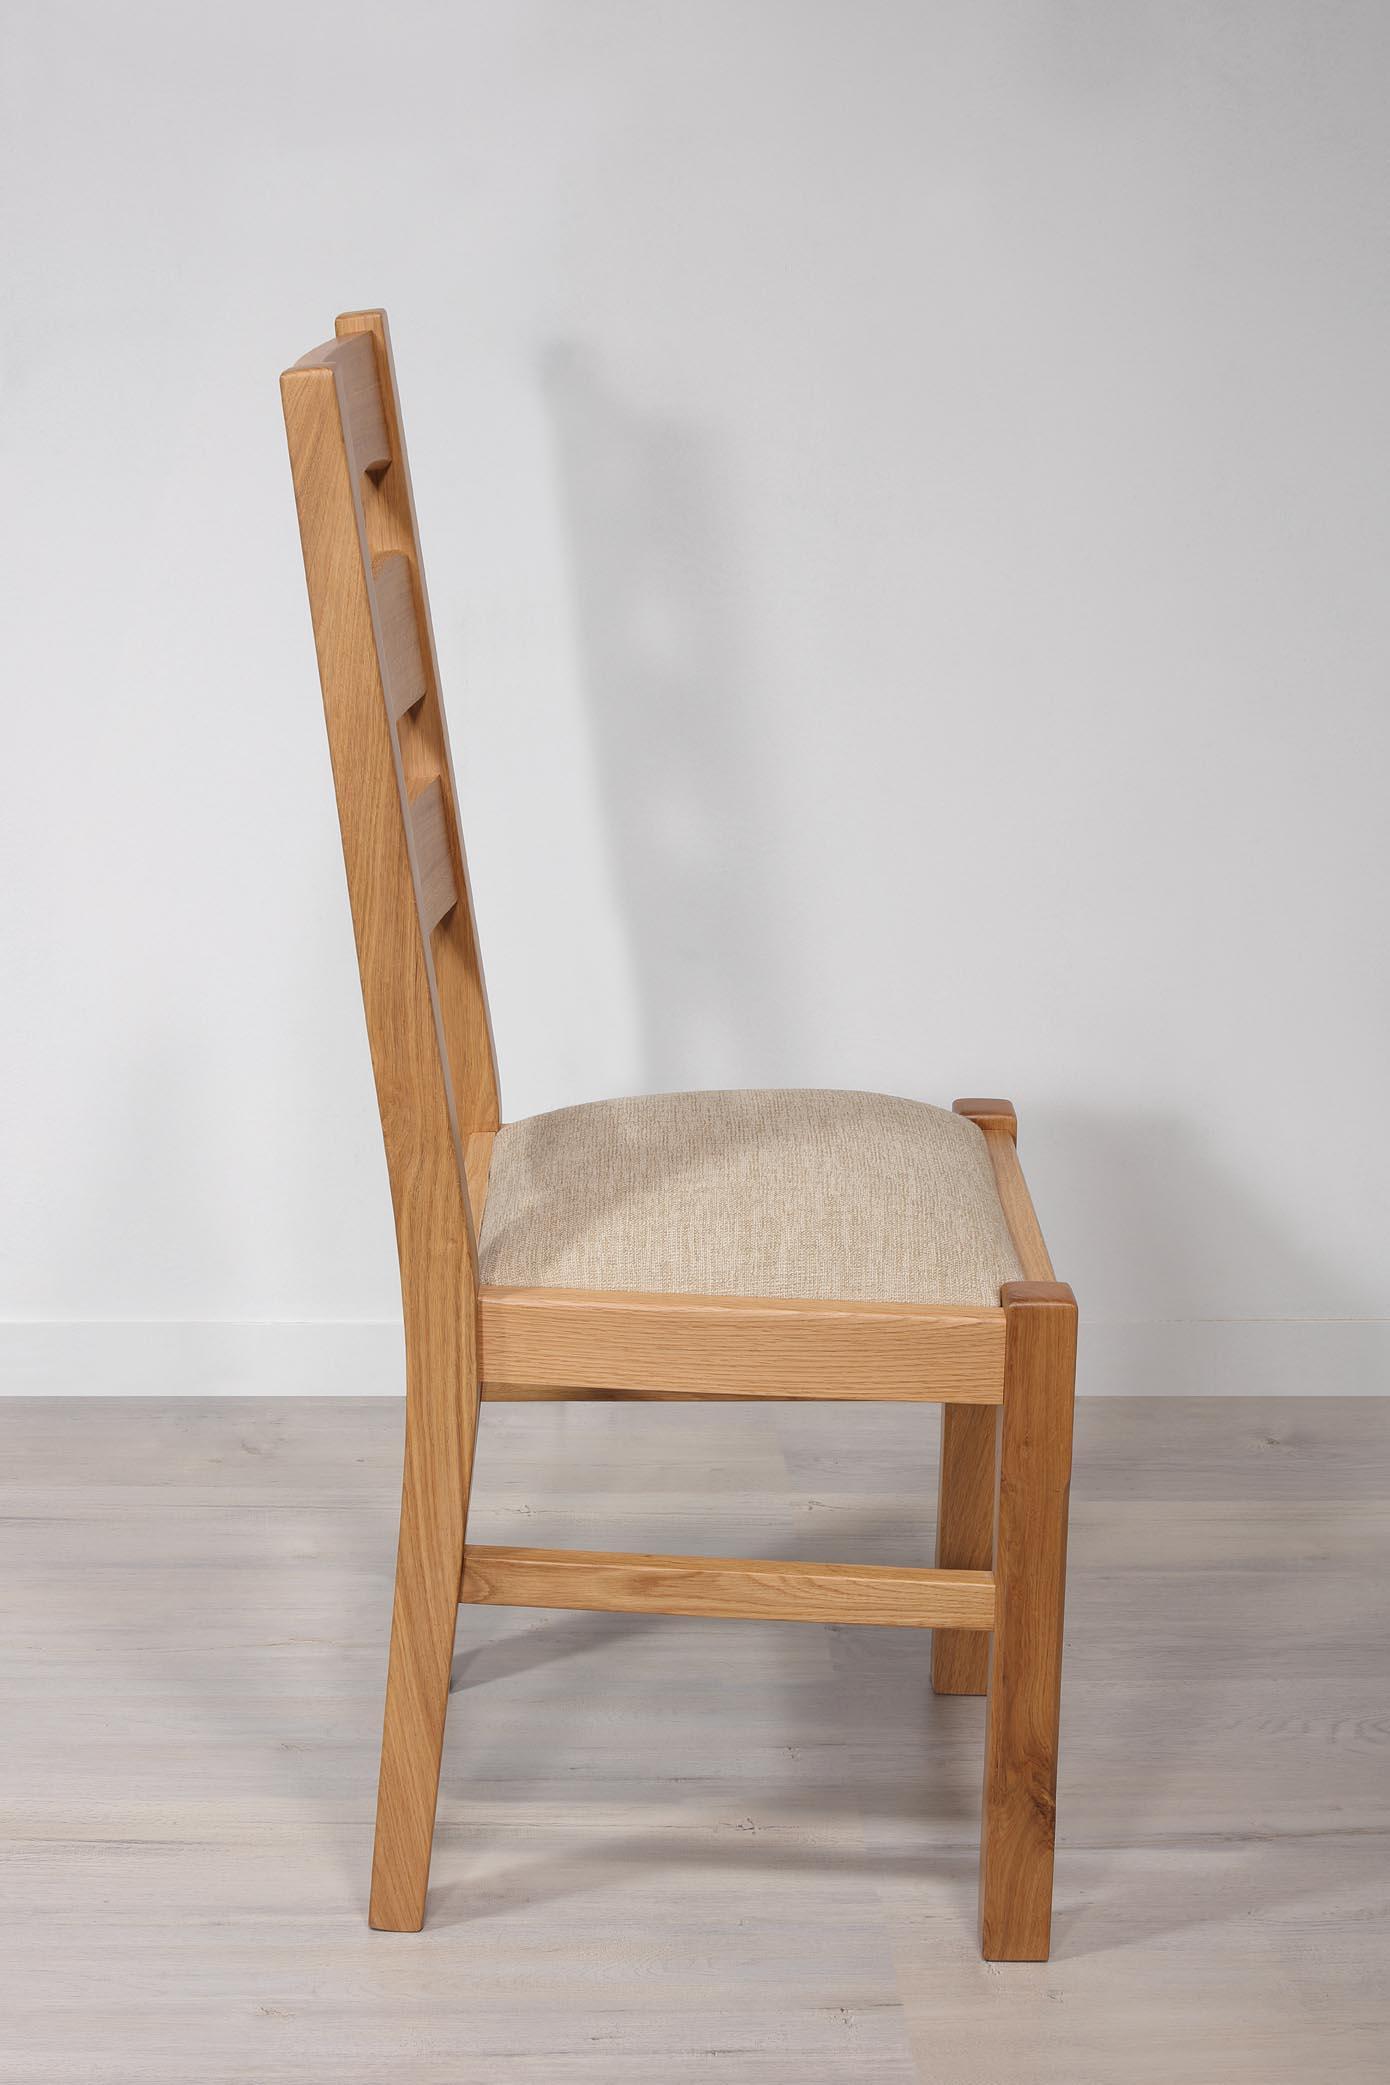 De Nestor Chêne Style Beige Massif Campagnard Tissu Chaise En Assise yN8v0wOmnP